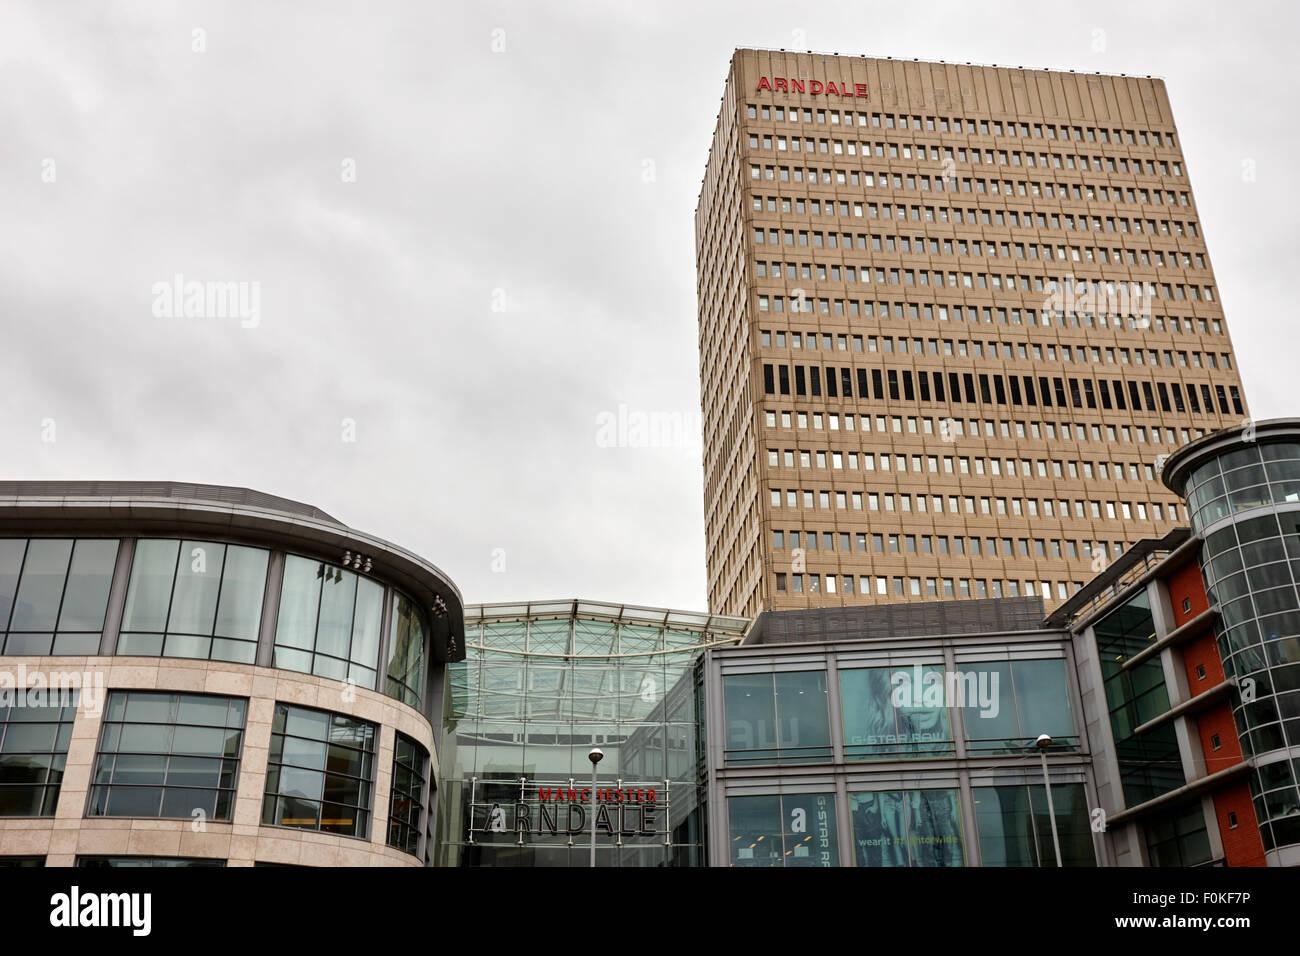 Das Einkaufszentrum Arndale and Office tower Manchester England UK Stockbild